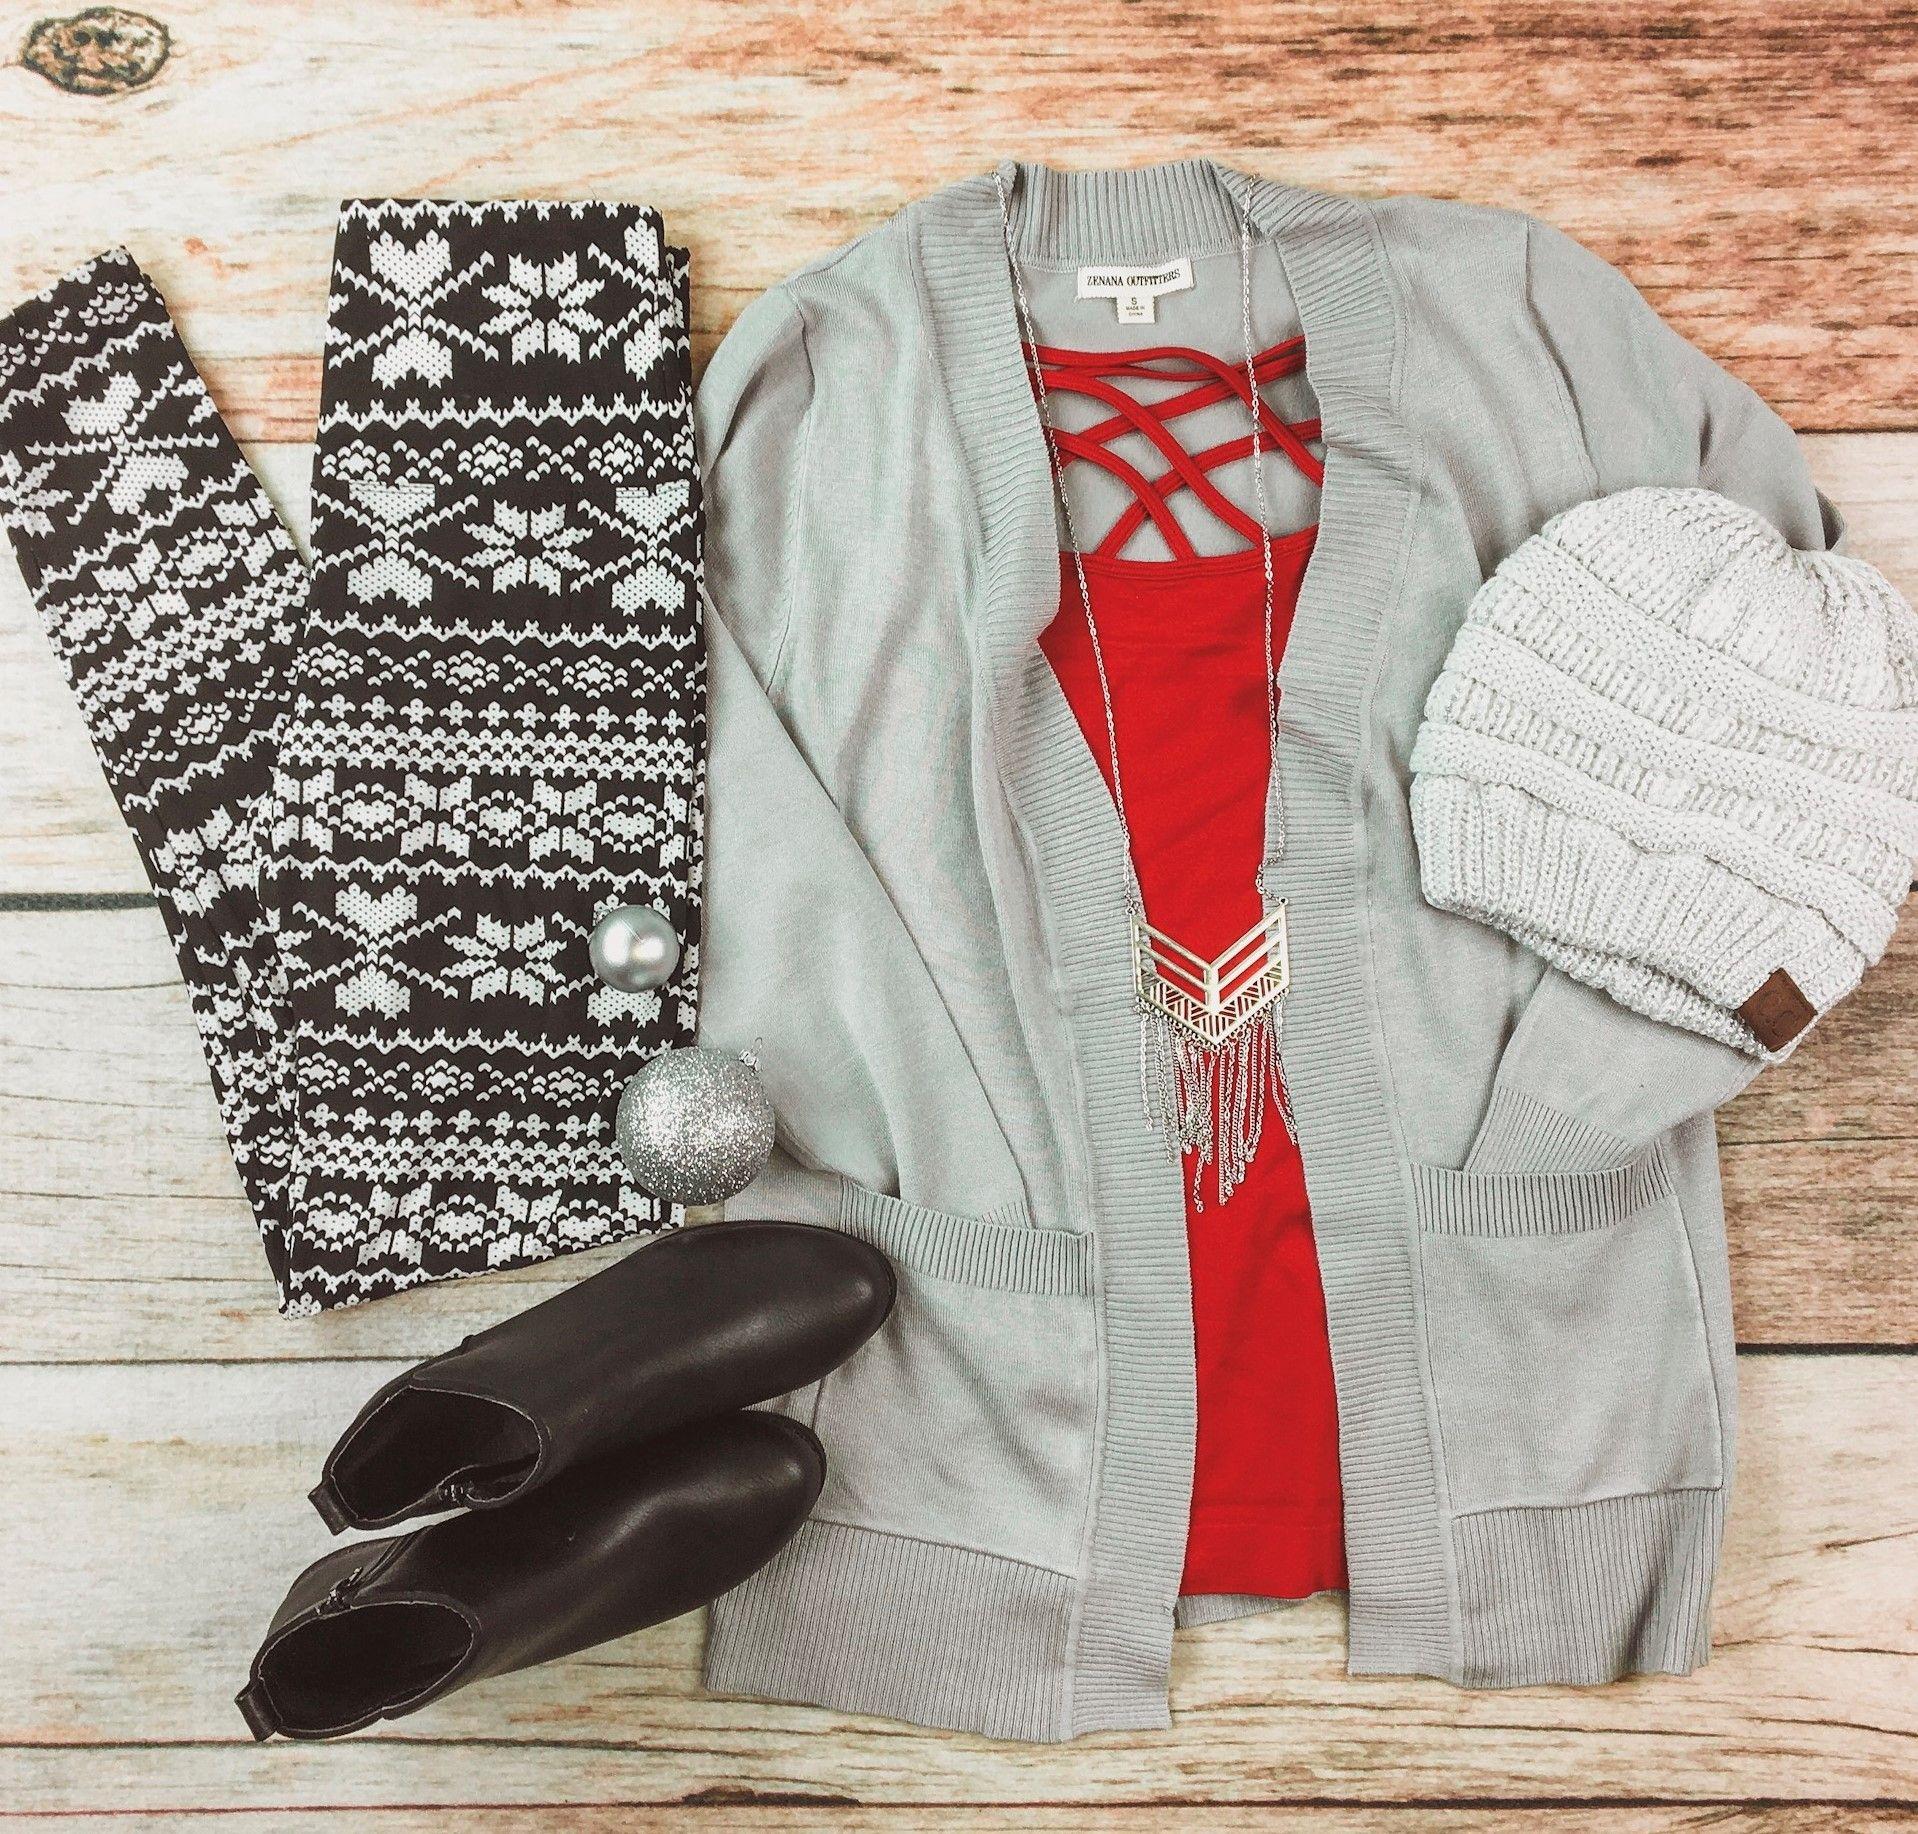 b55b277c6b8fd4 Ambrie. Ambrie clothing. christmas leggings. cc beanie. | Ambrie ...